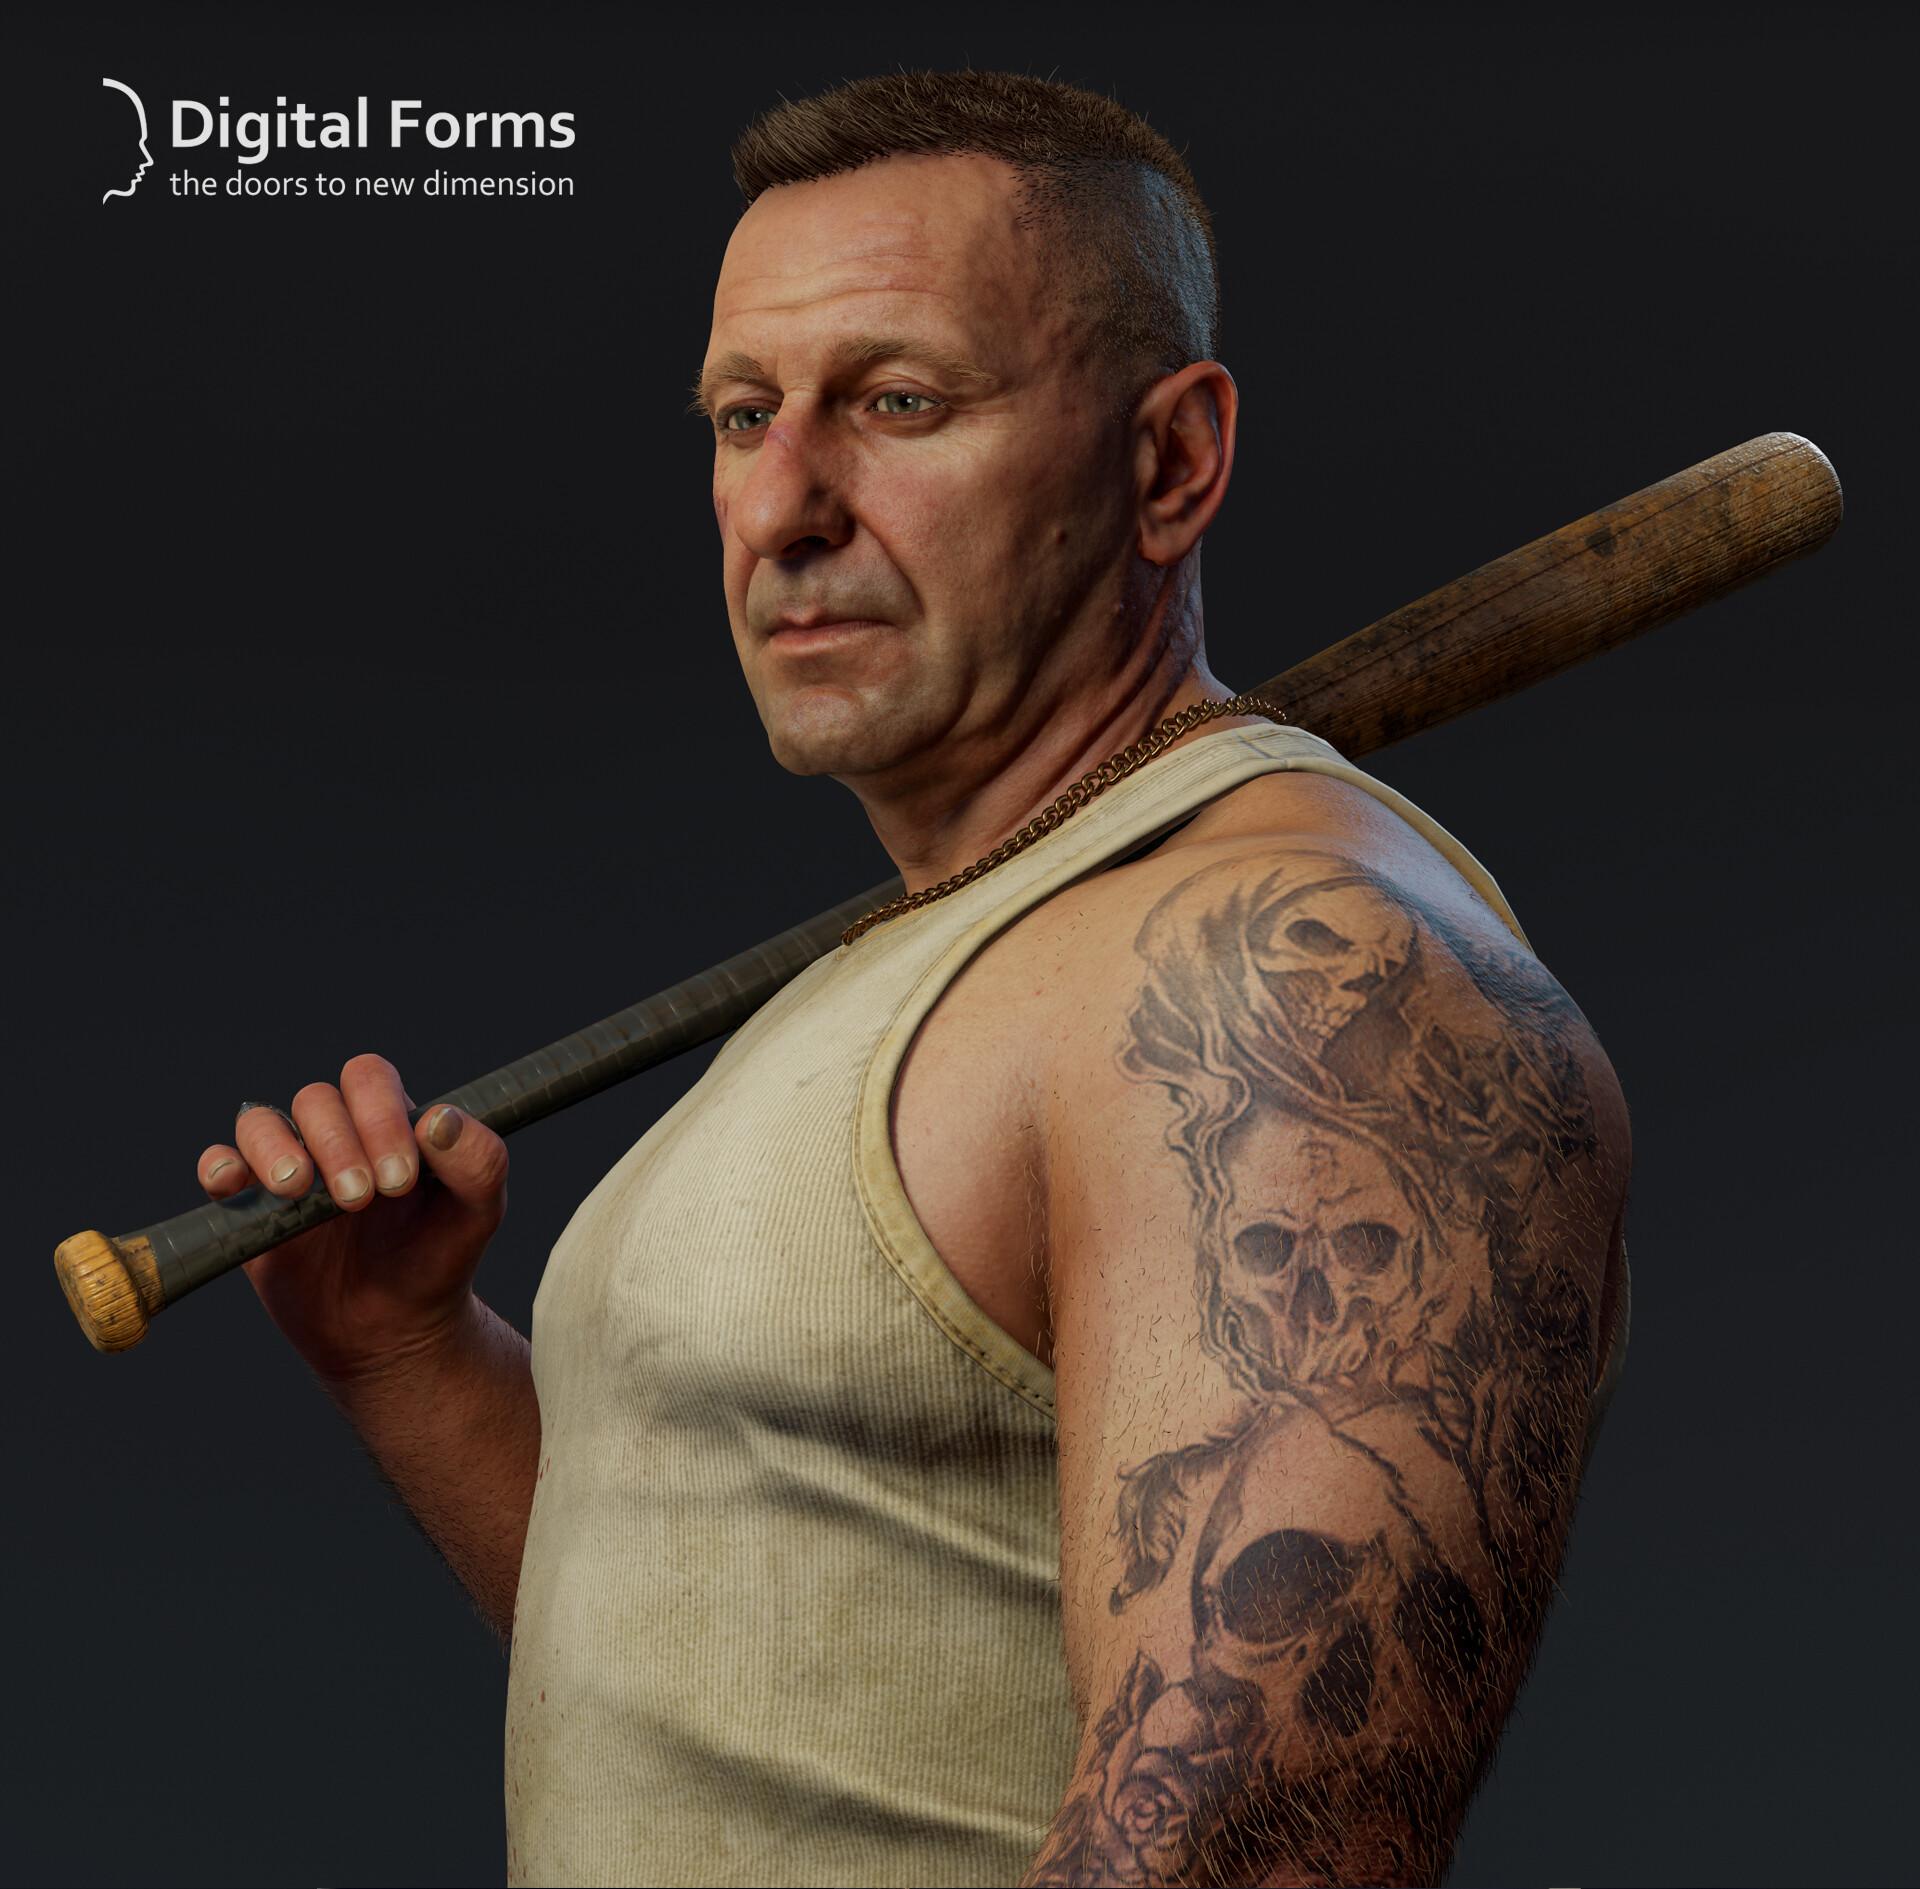 Digital forms 10 digitalforms